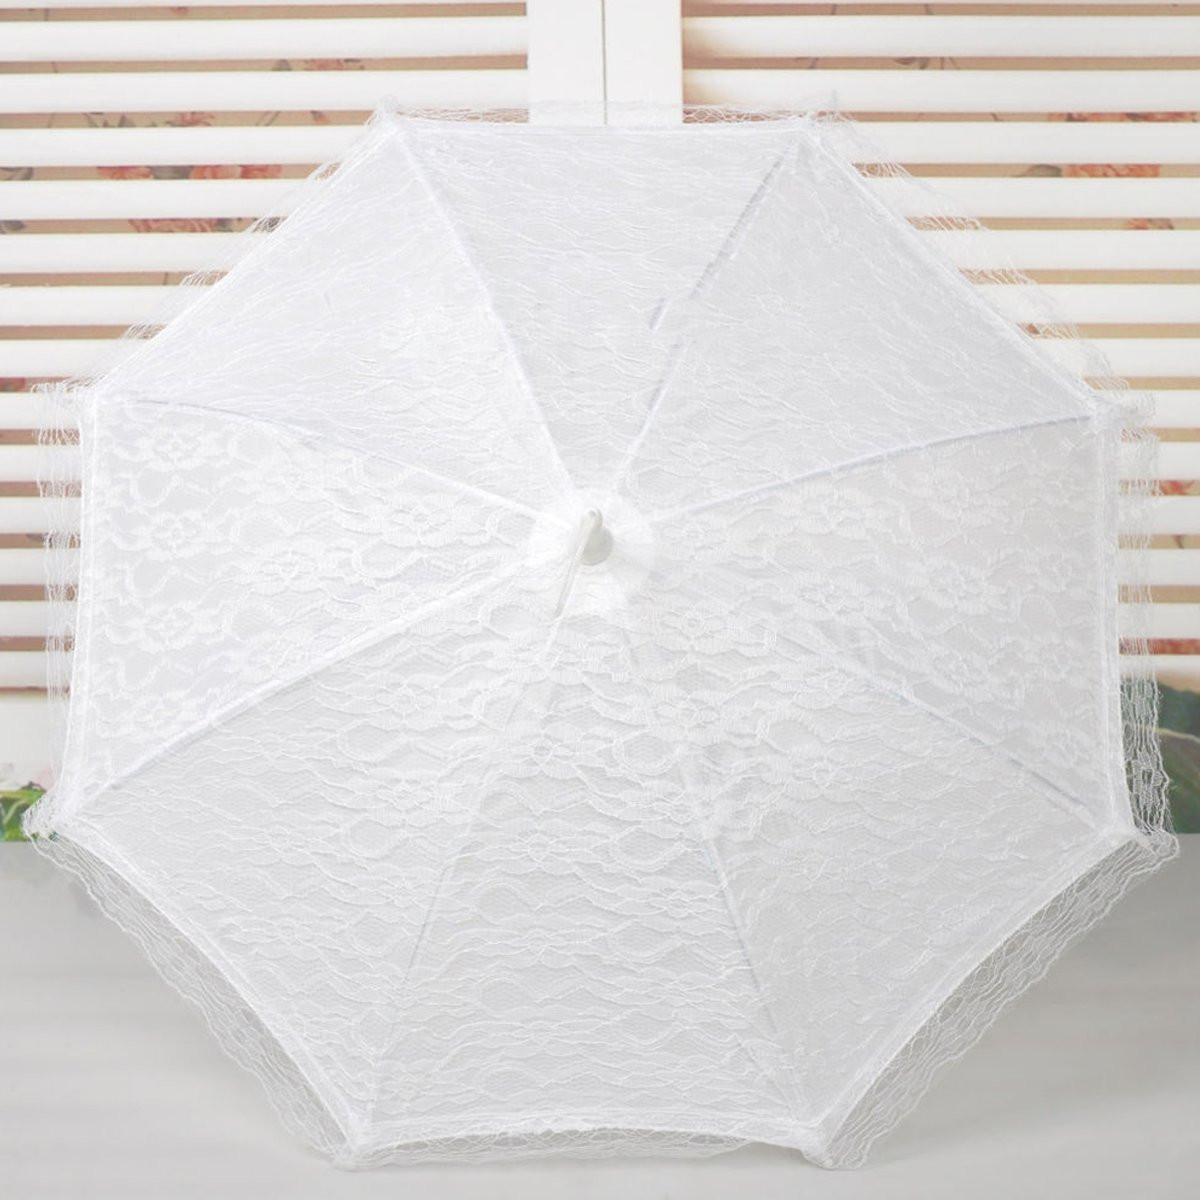 54CM Bride Handmade Flower Girls Battenburg Lace Parasol Wedding Party Sun Umbrella